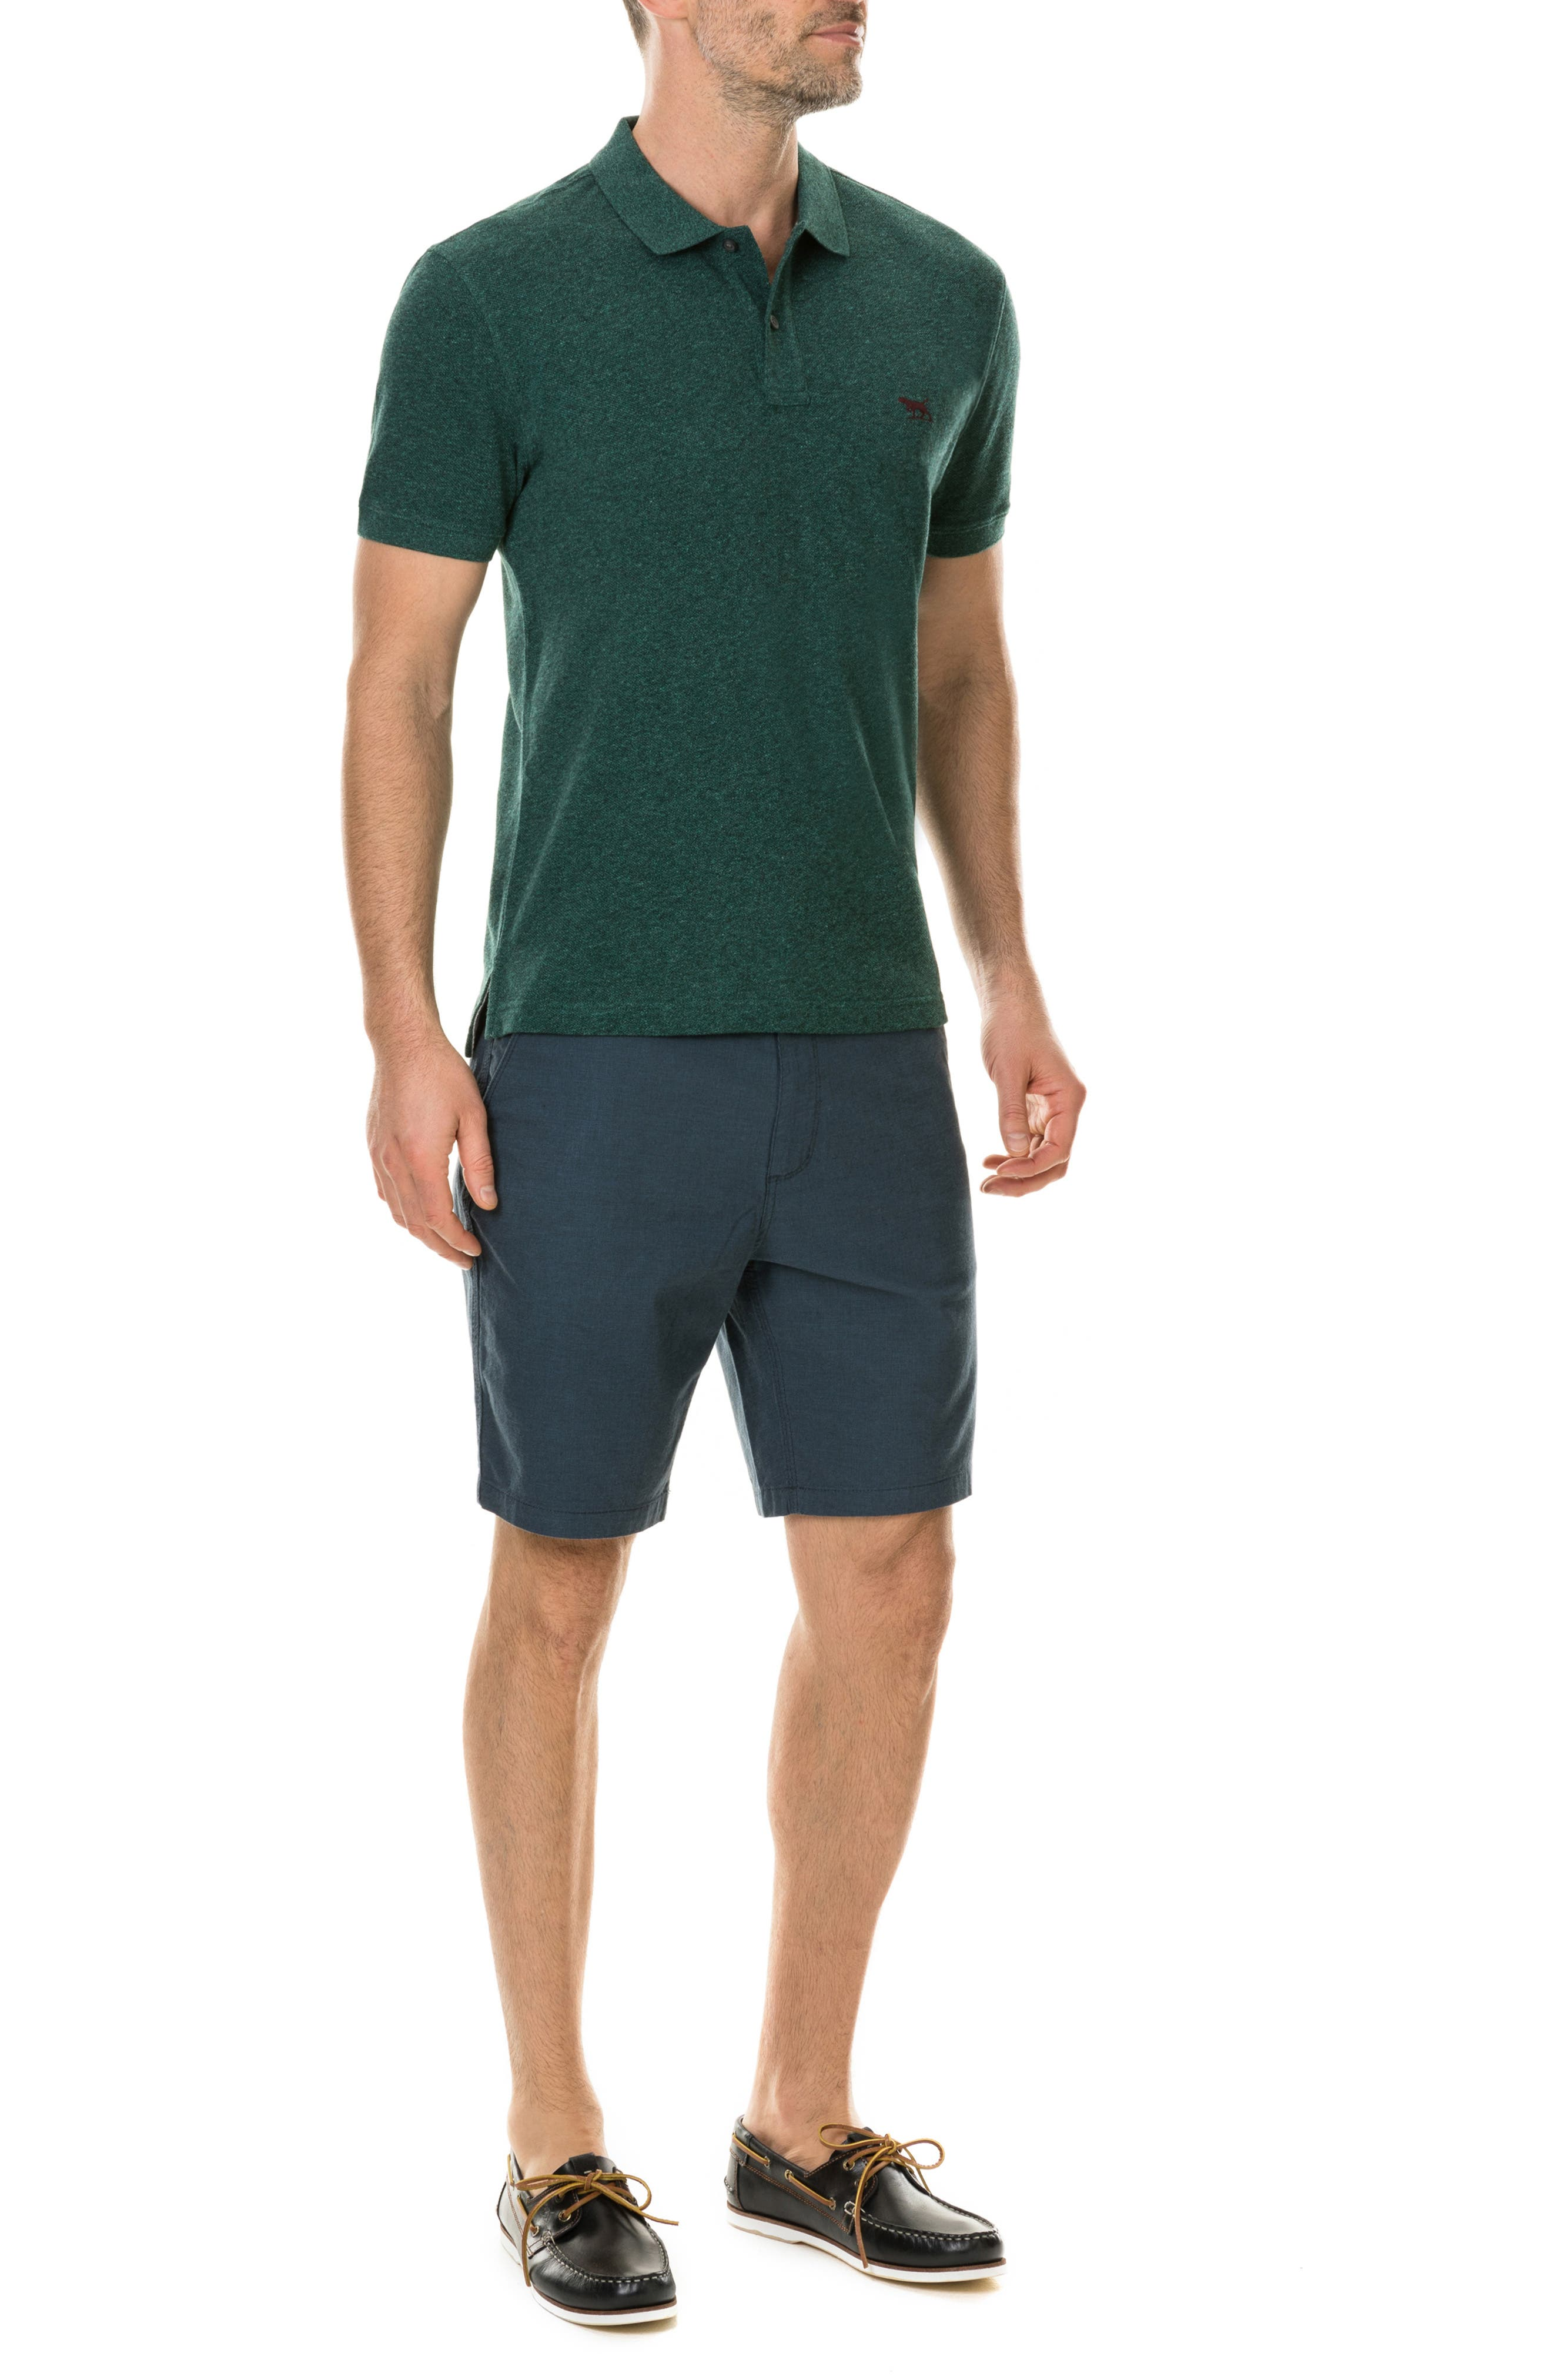 'The Gunn' Piqué Sports Fit Cotton Polo,                             Alternate thumbnail 5, color,                             PINE